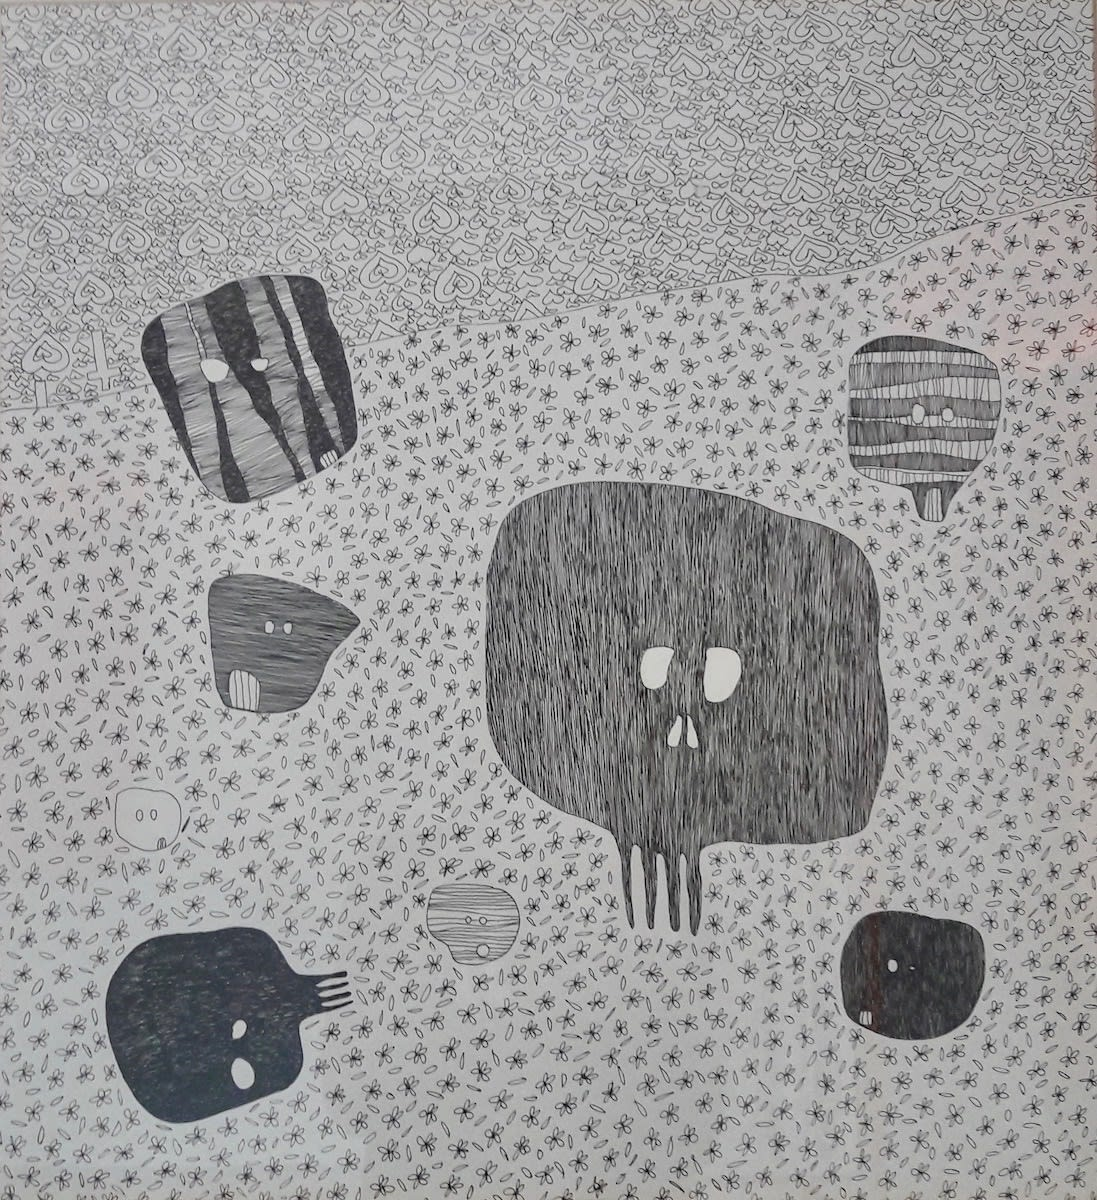 Waswad Beneath Amazing Stuff 2016 Ink On Paper 46 Cm X 50 Cm